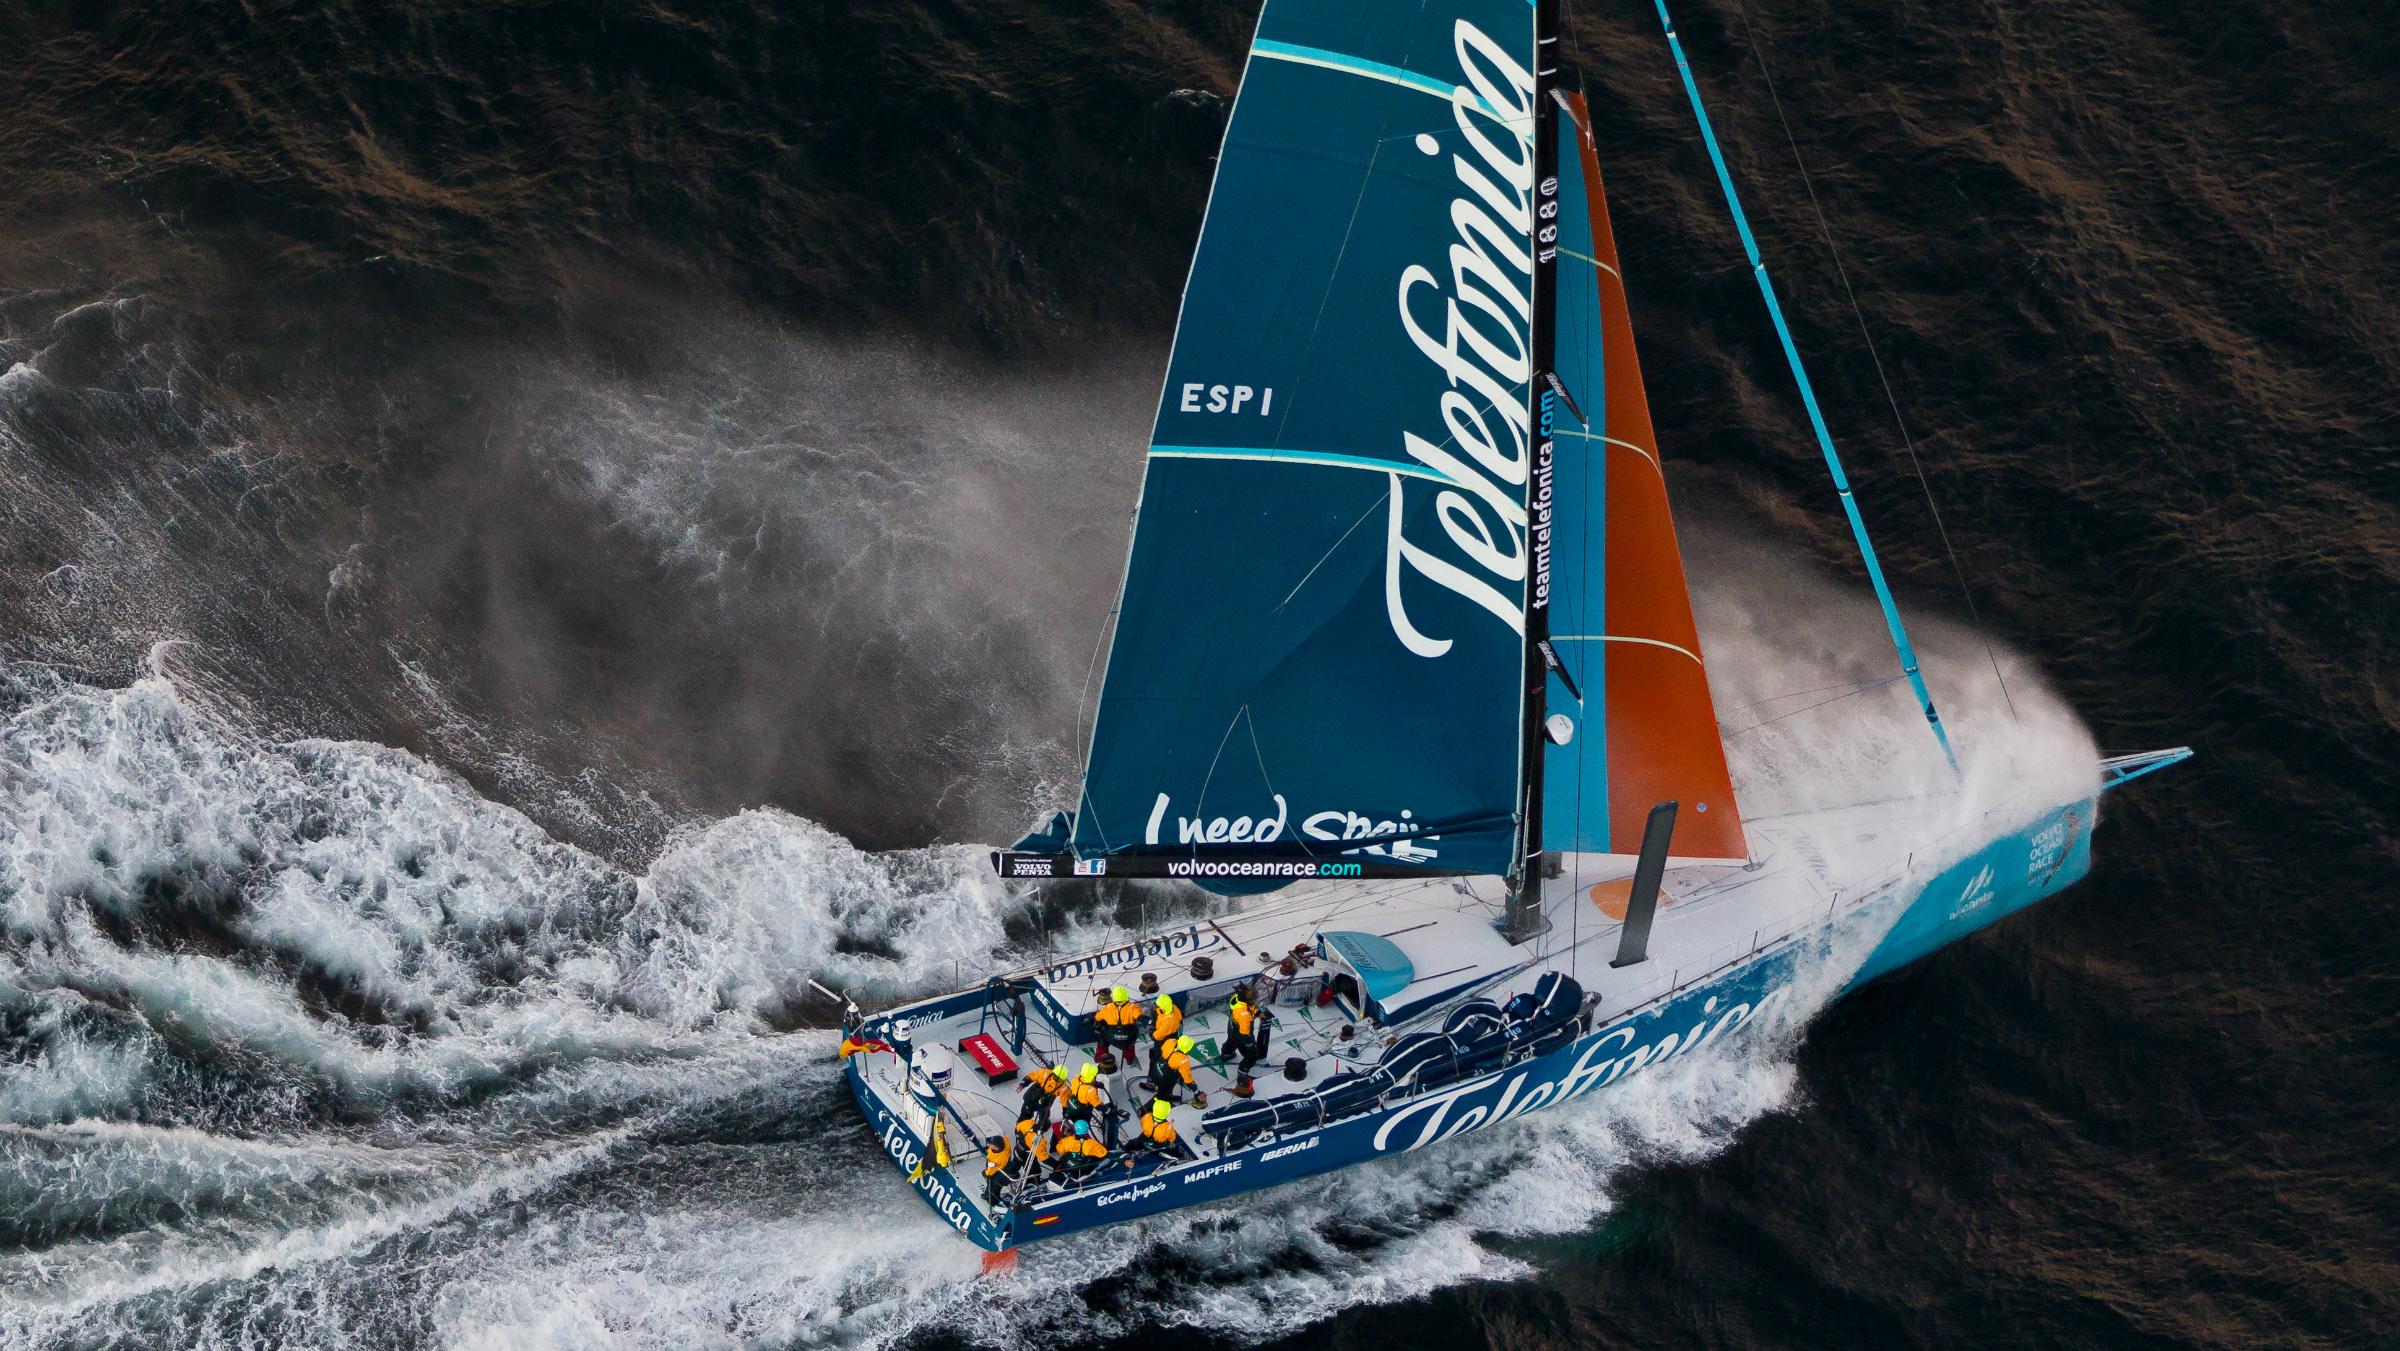 telefonica sail boat profit merger